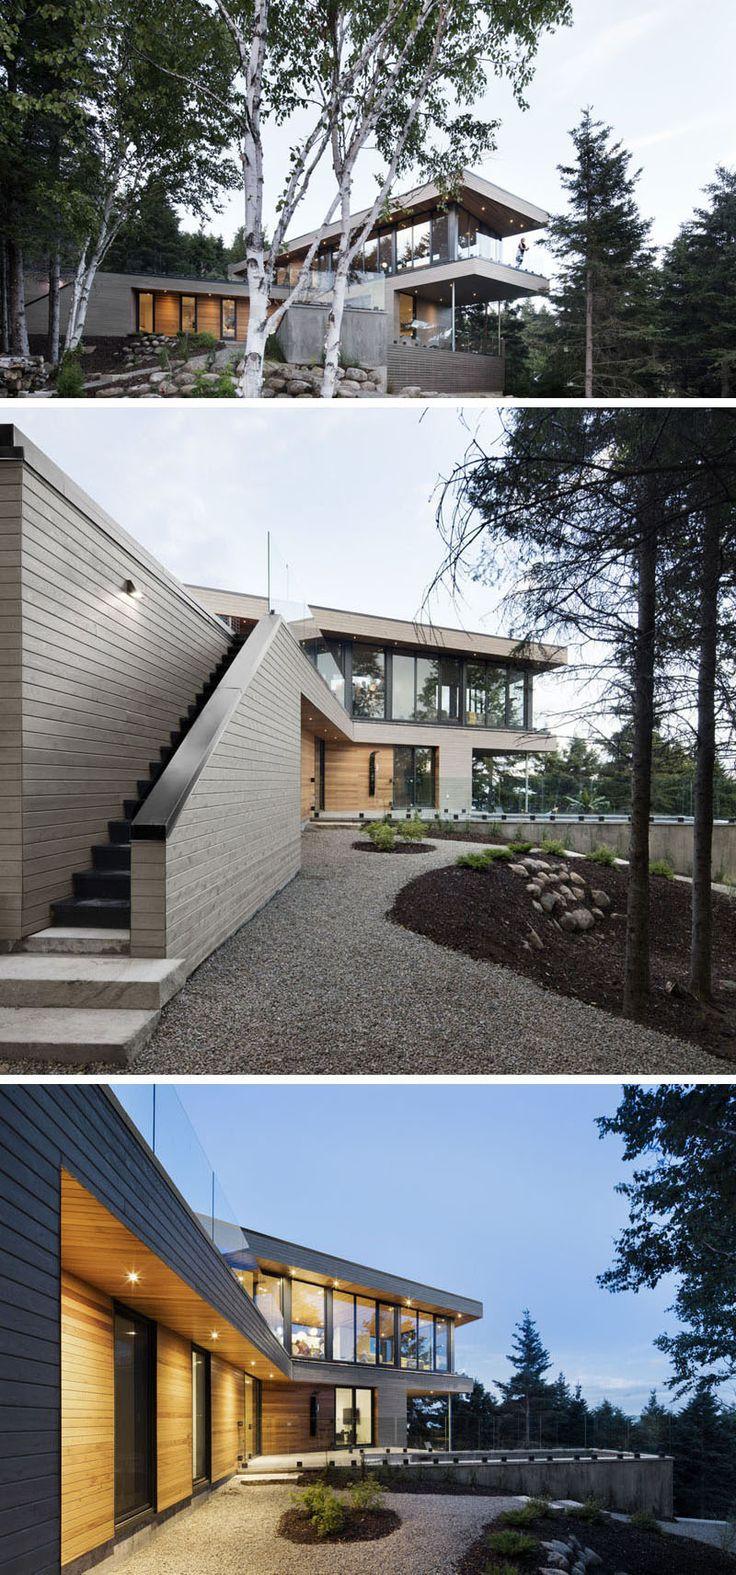 24983 best Architecture \u0026 Interior images on Pinterest ...